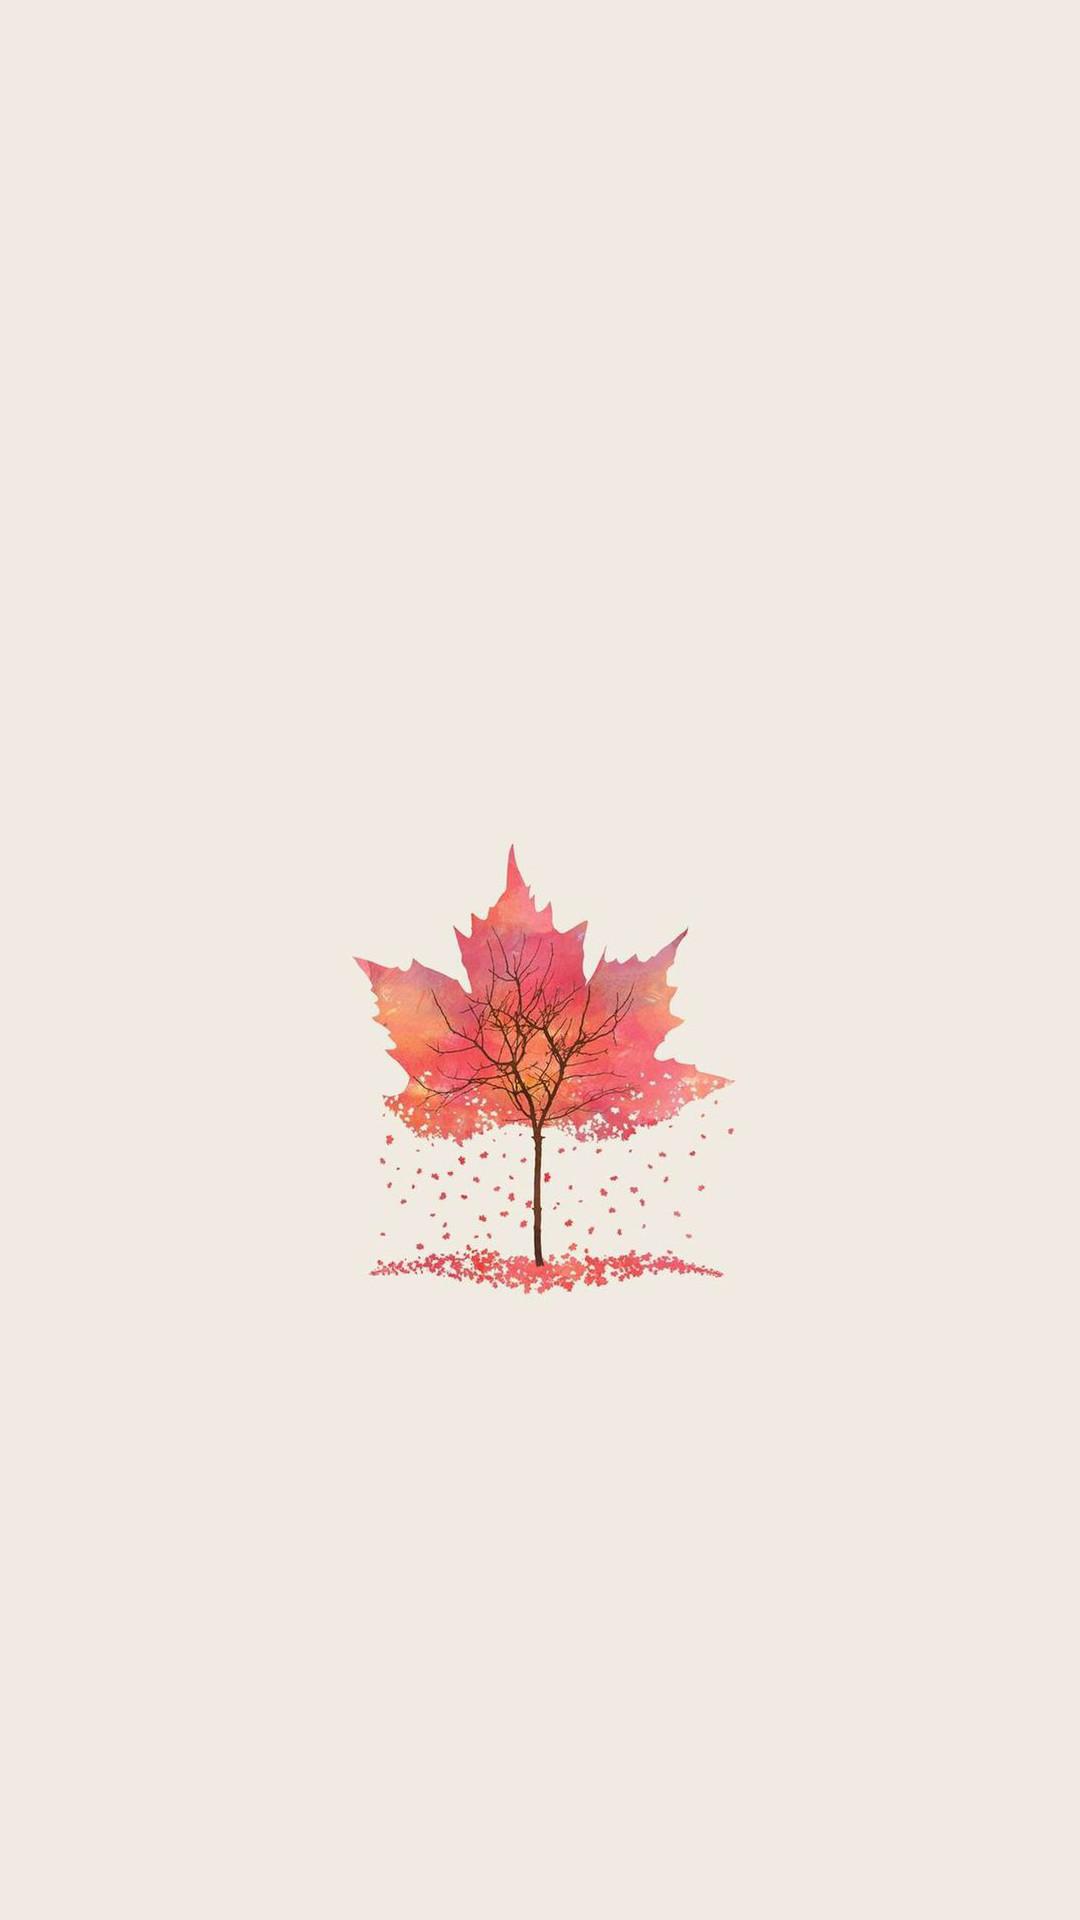 Autumn Tree Leaf Shape Illustration iPhone 6+ HD Wallpaper